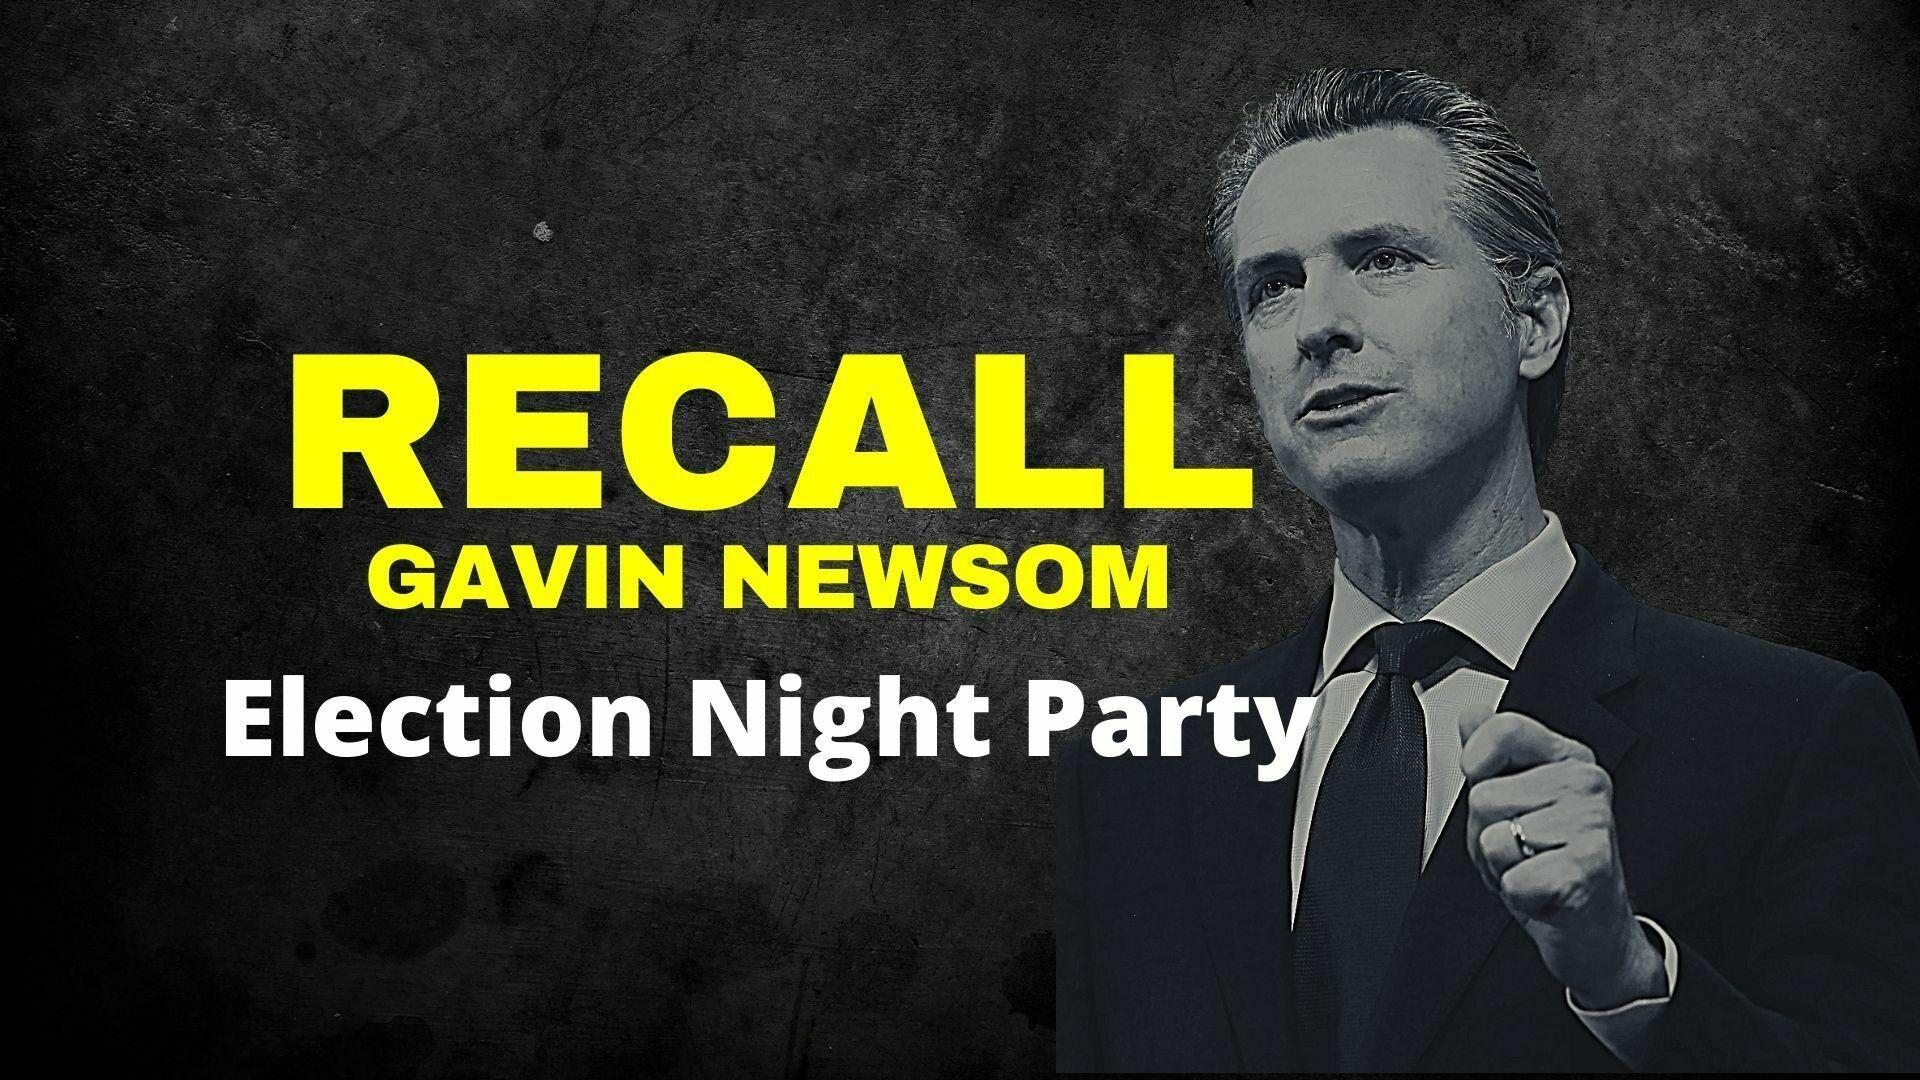 Recall newsom election night party